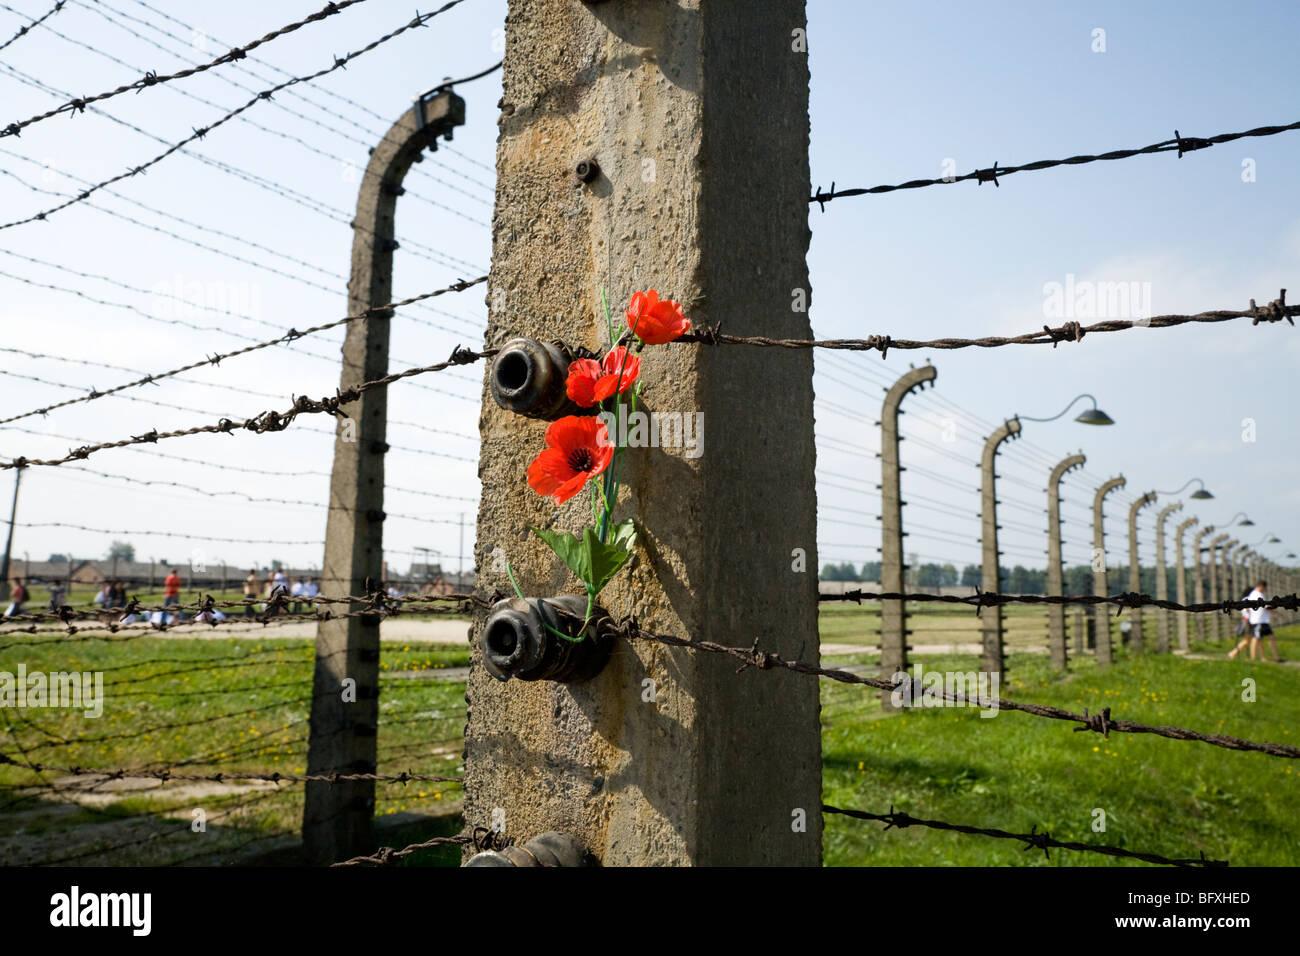 Poppy placed in the barbed wire of the perimeter fence / Birkenau (Auschwitz II Birkenau) Nazi death camp in Oswiecim, - Stock Image